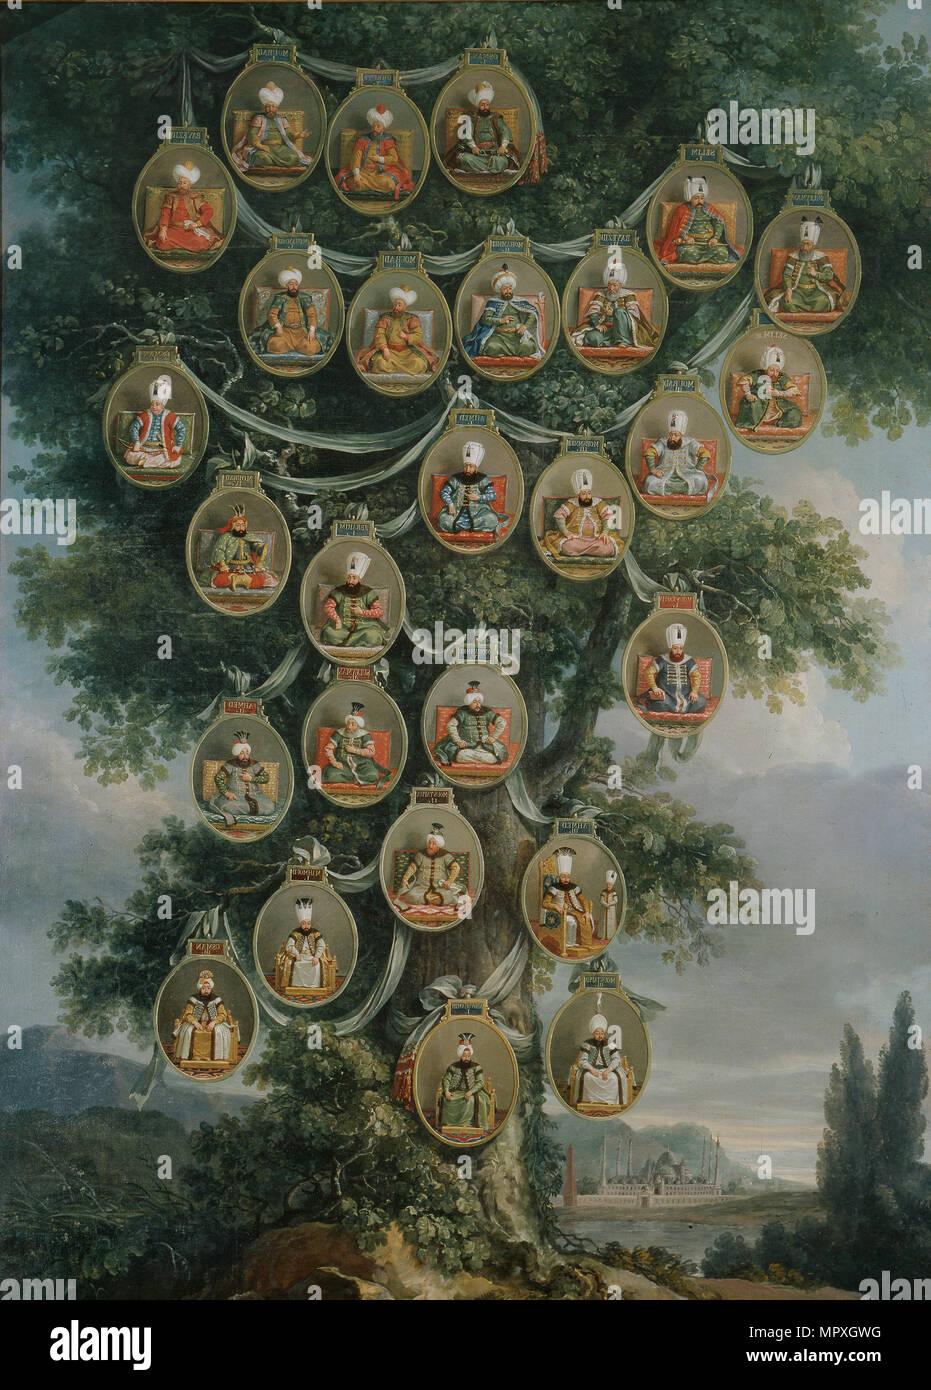 The Sultans of the Ottoman Empire. - Stock Image